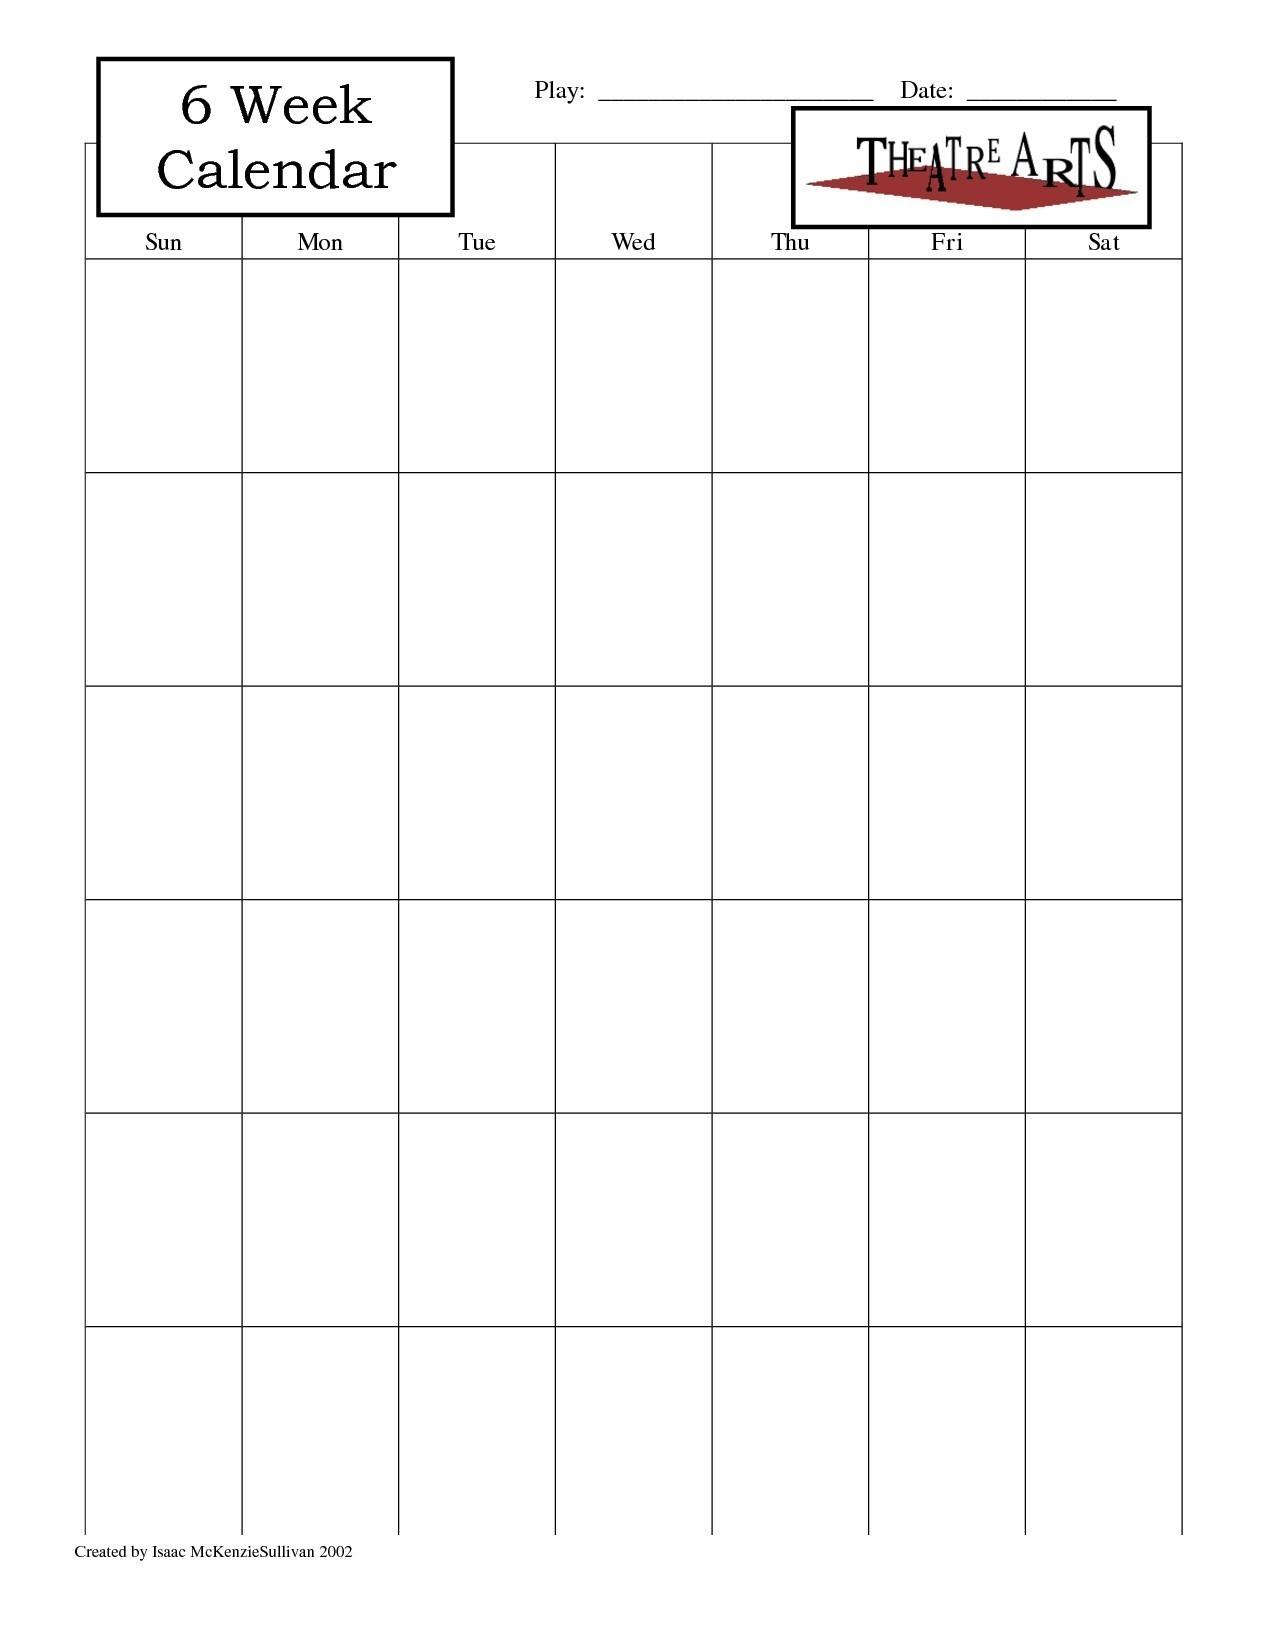 Blank 6 Week Calendar | Thekpark-Hadong-Blank 6 Week Calendar Template